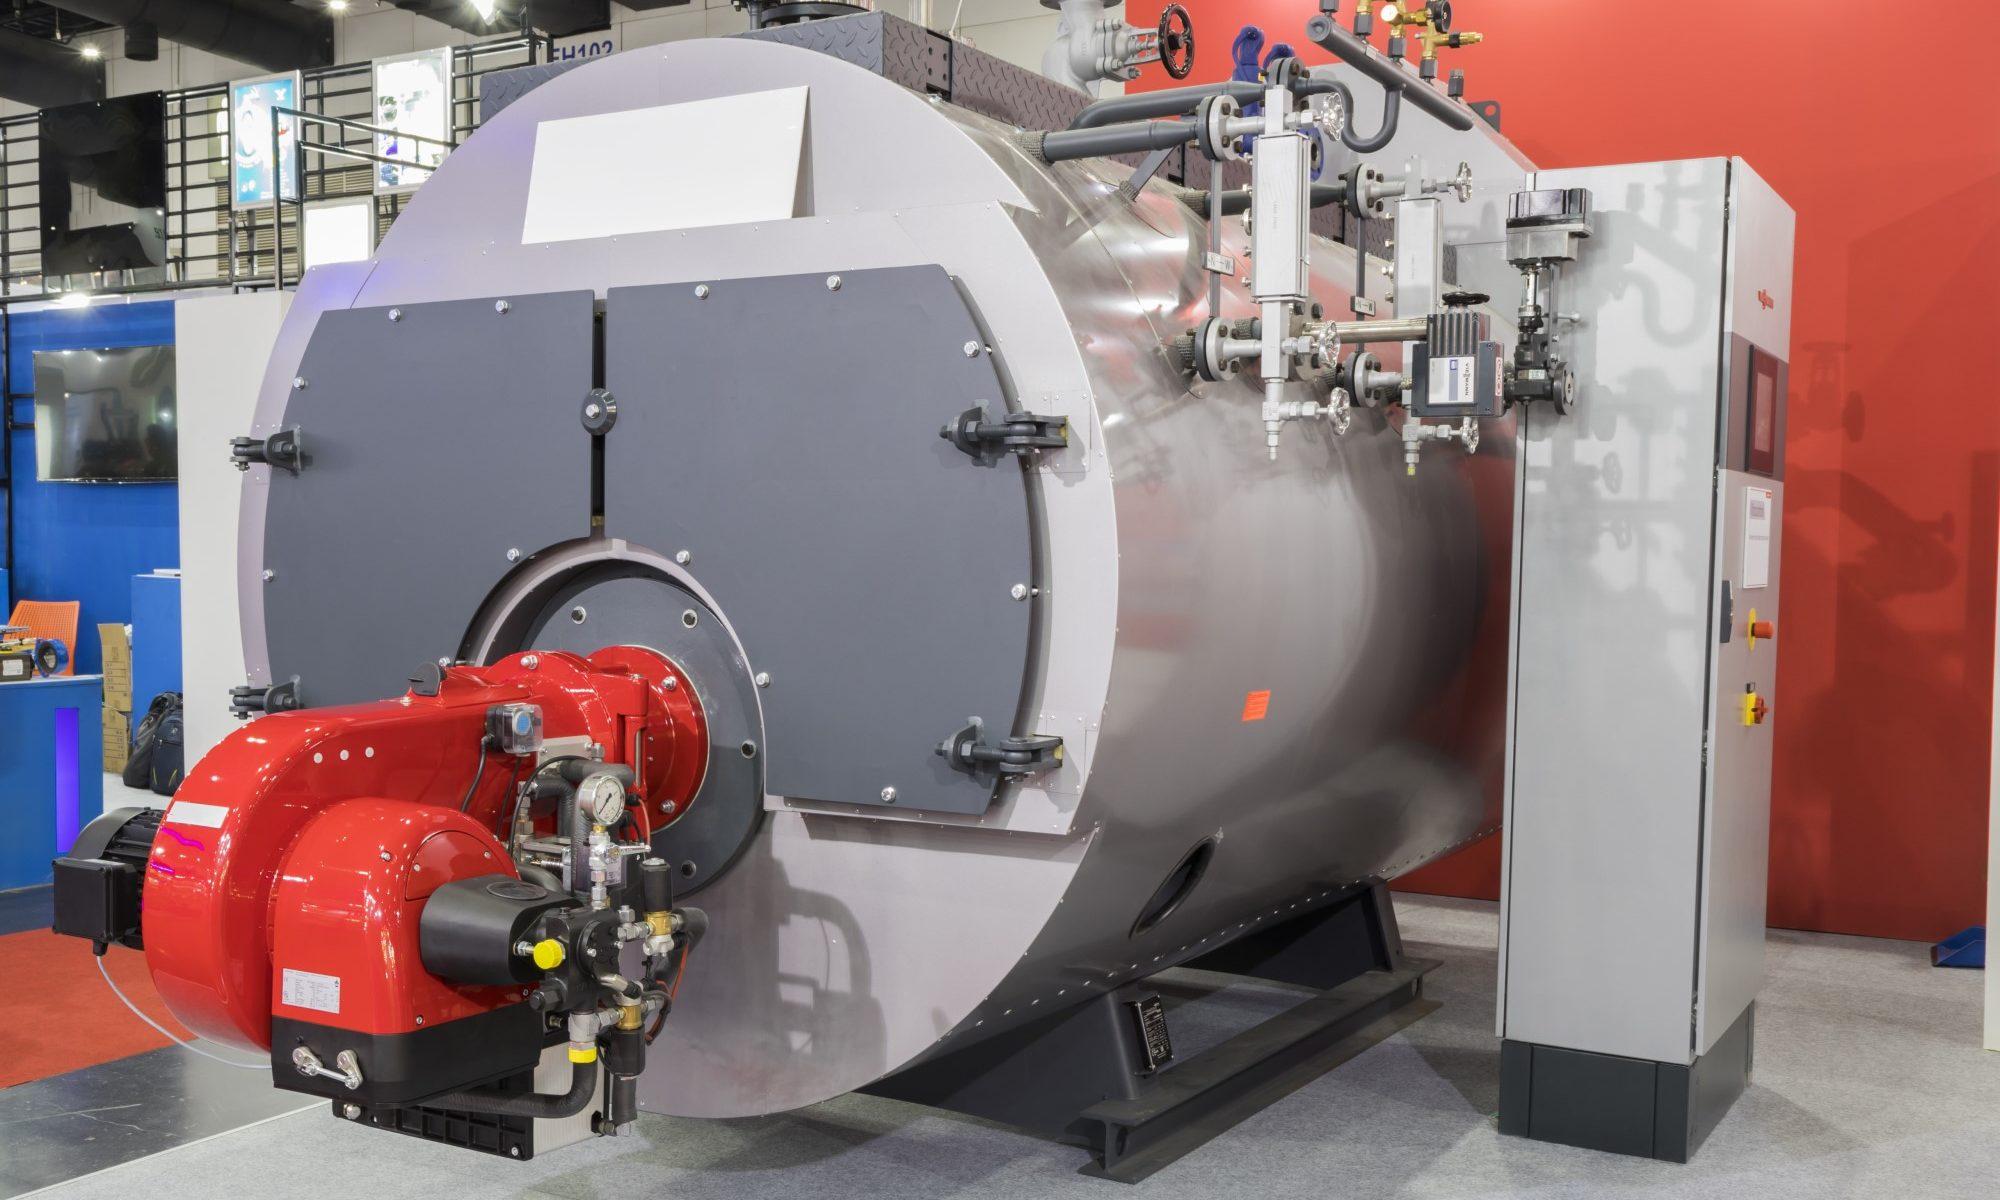 Combustion Control boiler all set up